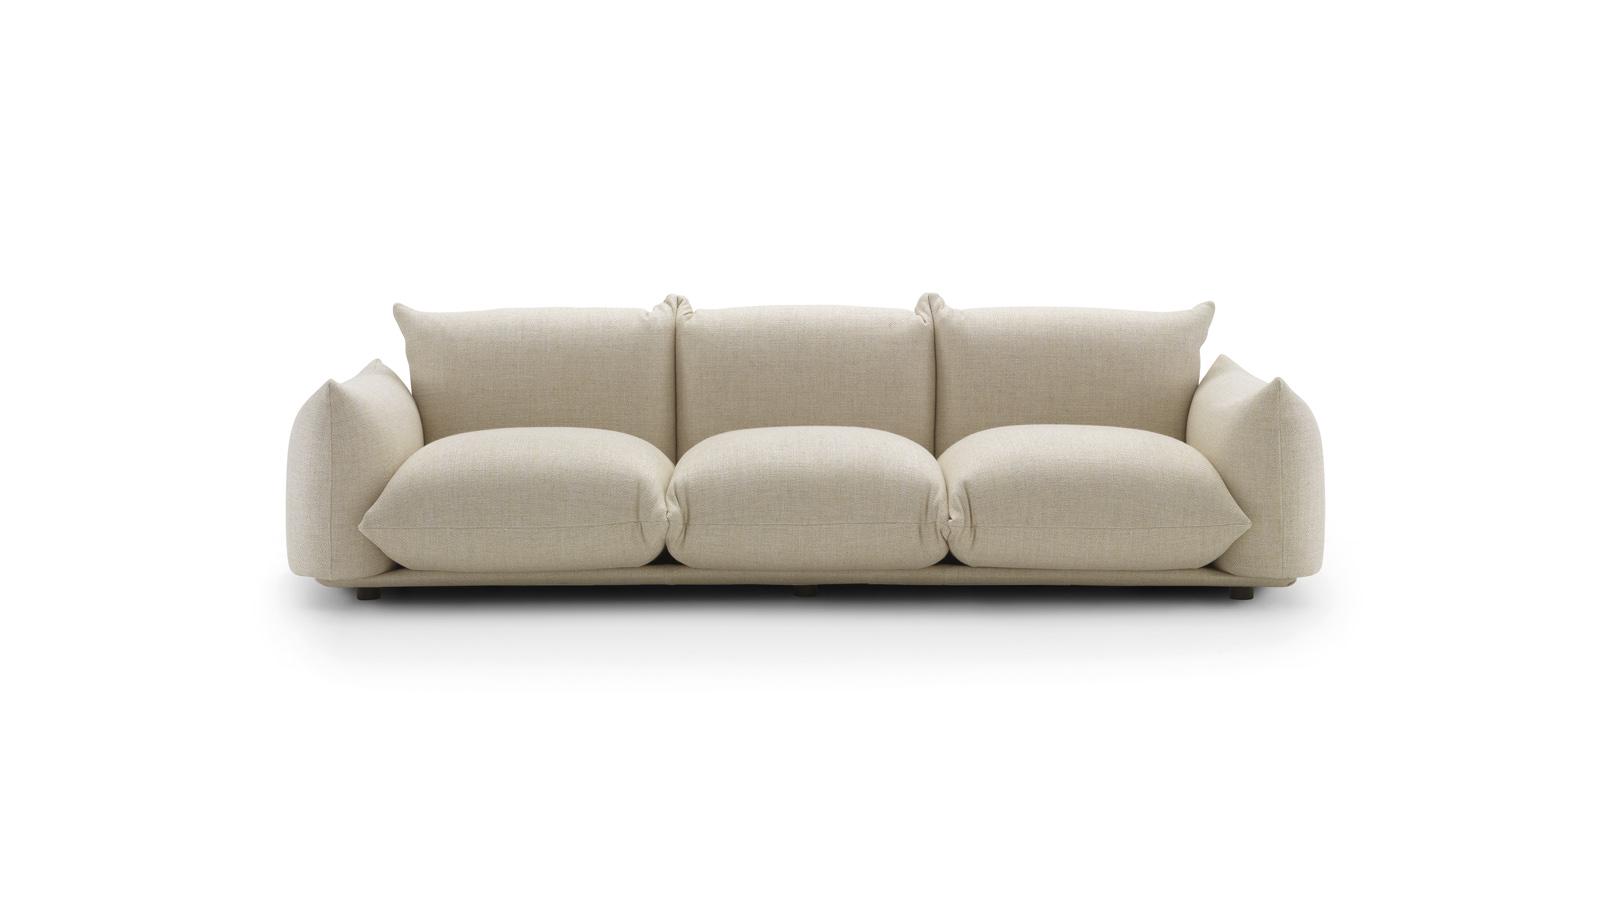 TinnappelMetz-arflex-marenco-sofa-01